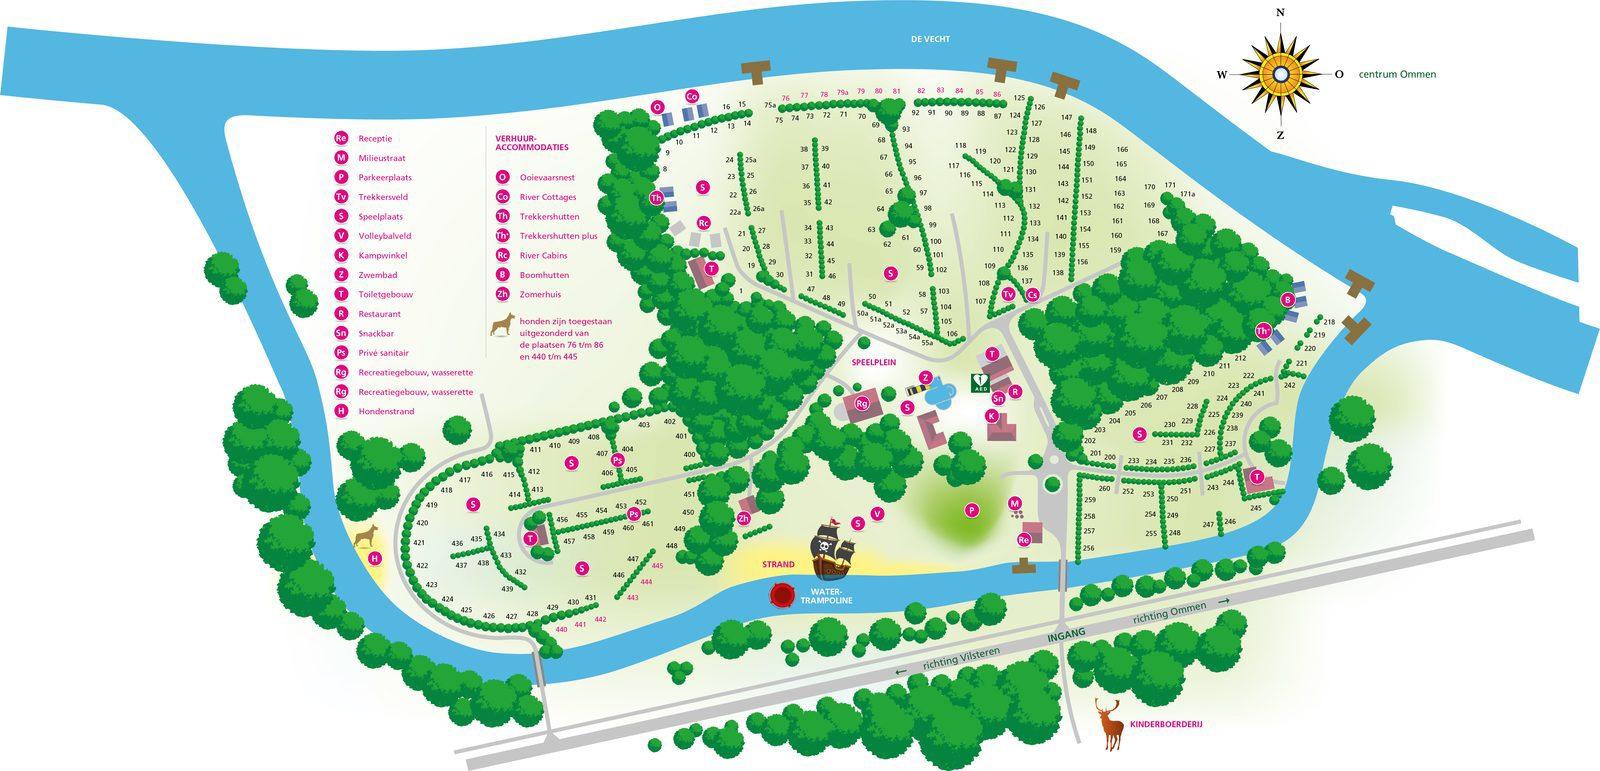 Campsite de Koeksebelt Ommen Map 2018